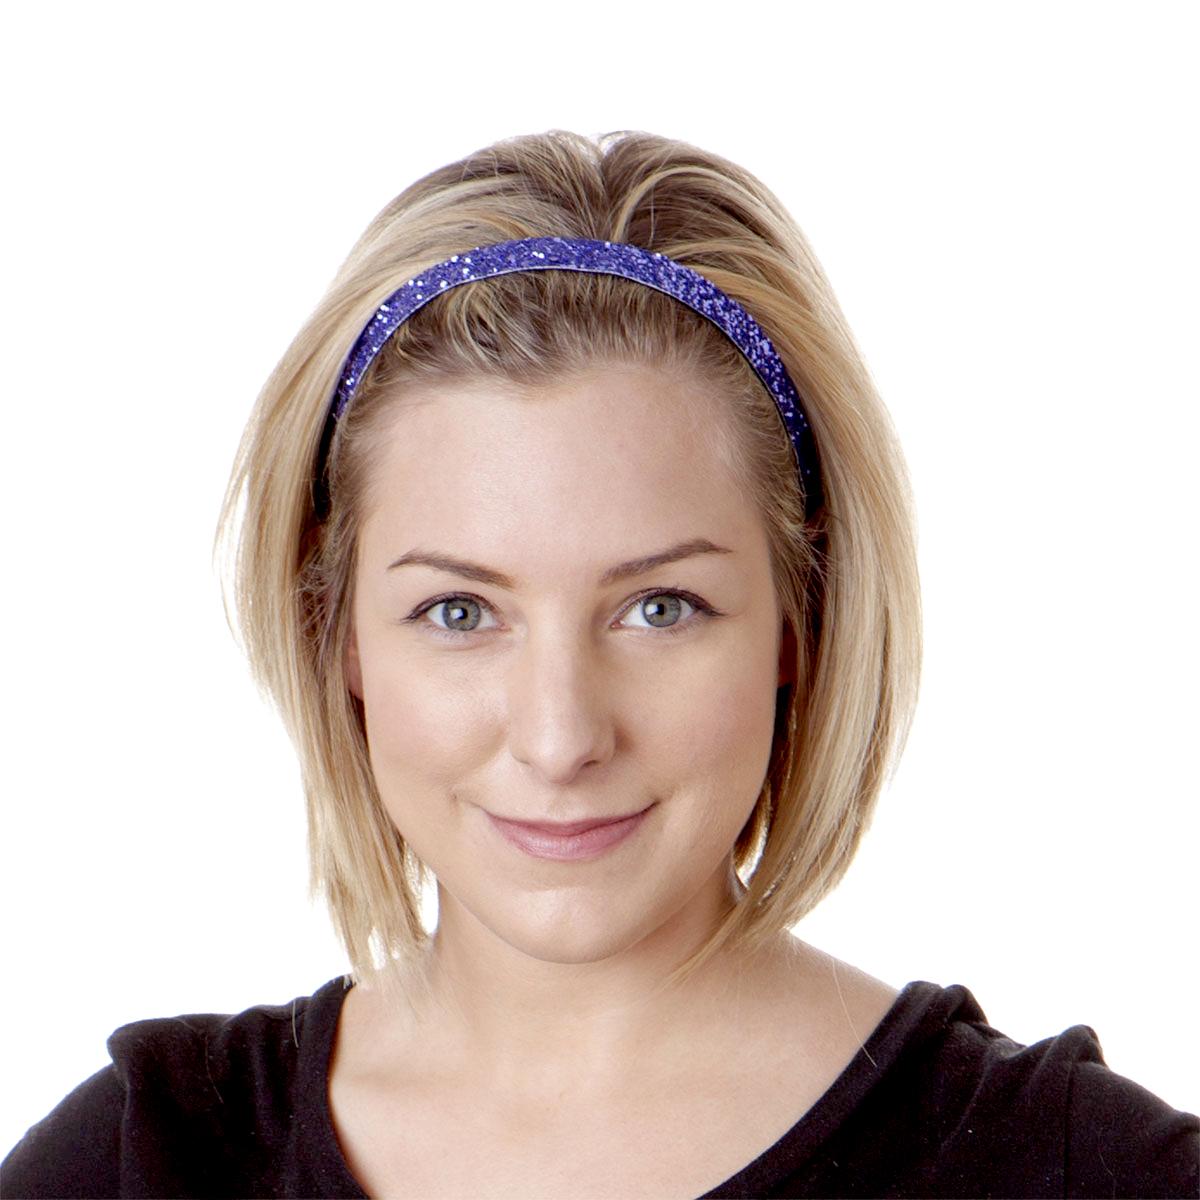 Hipsy Women's Adjustable NO SLIP Skinny Bling Glitter Headband (Purple)